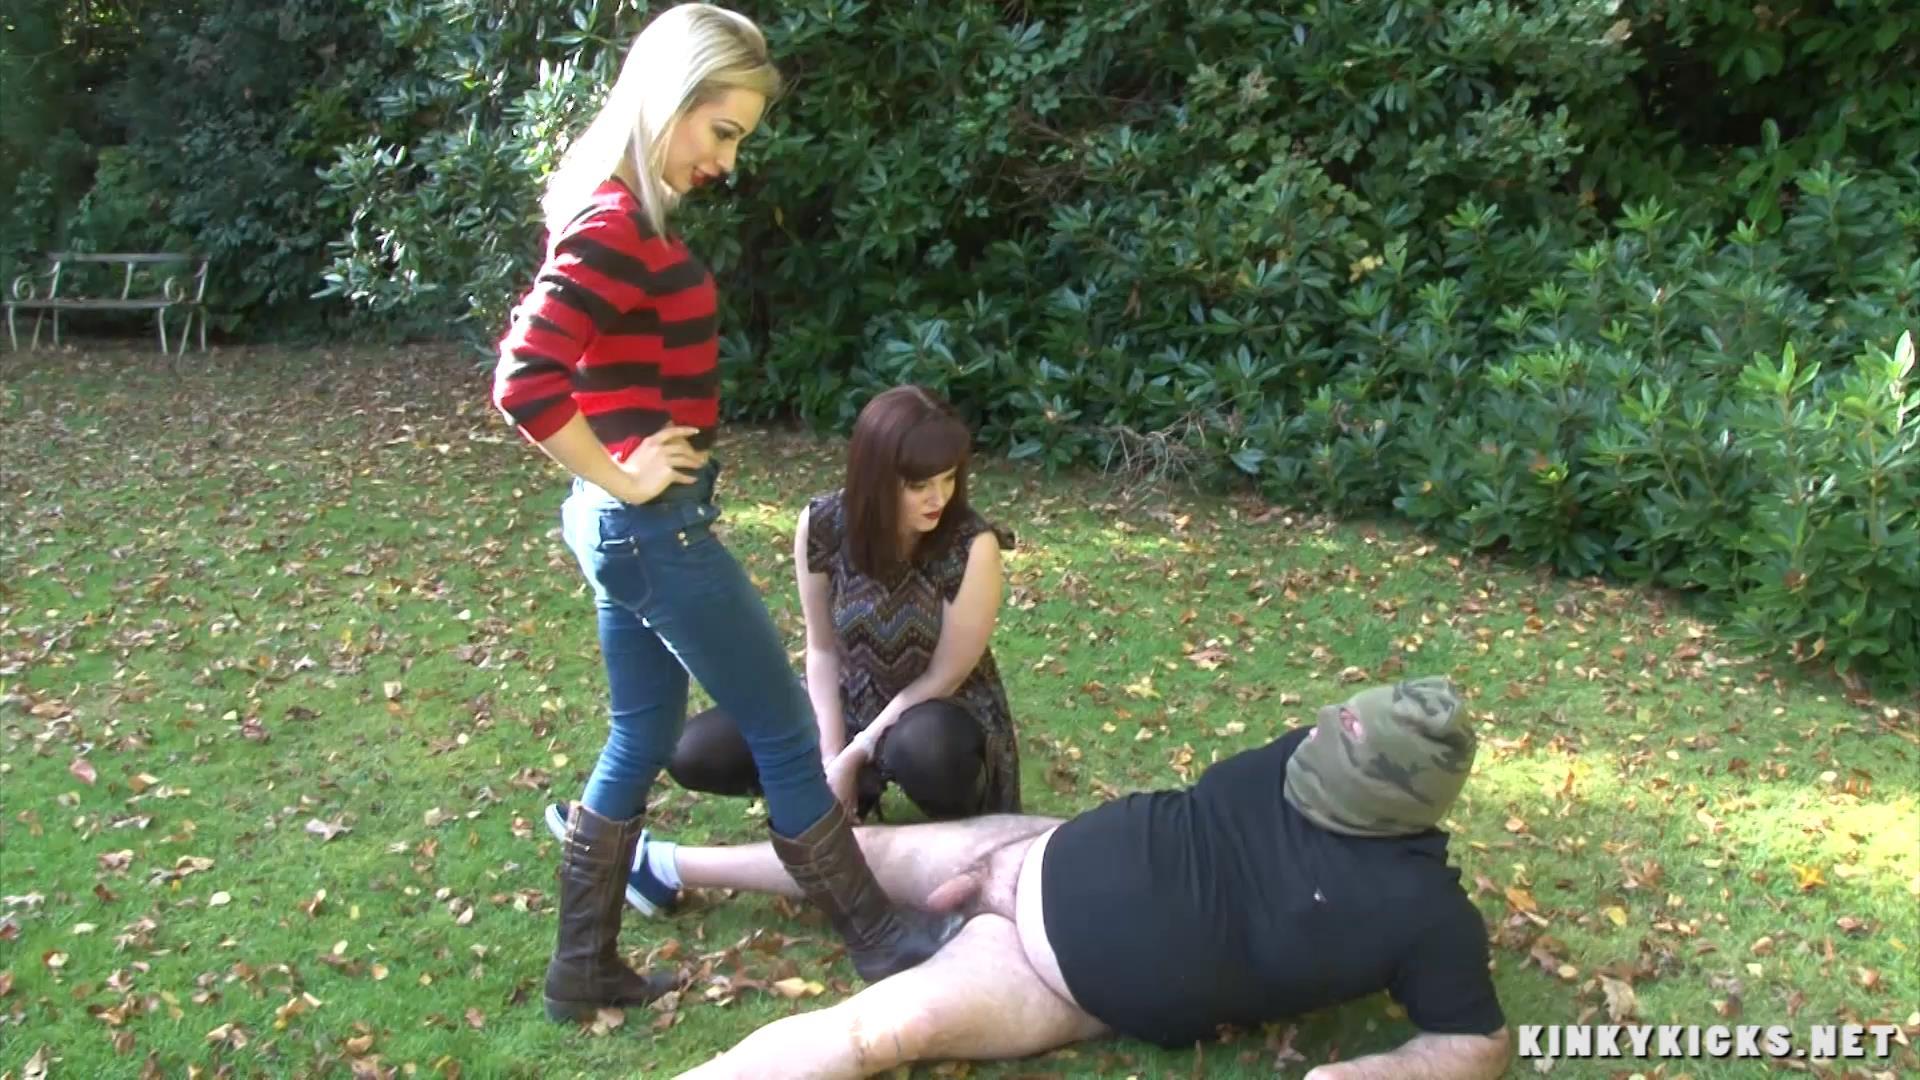 Chessie Kay, Zoe Page In Scene: In The Bushes - KINKYKICKS - FULL HD/1080p/MP4